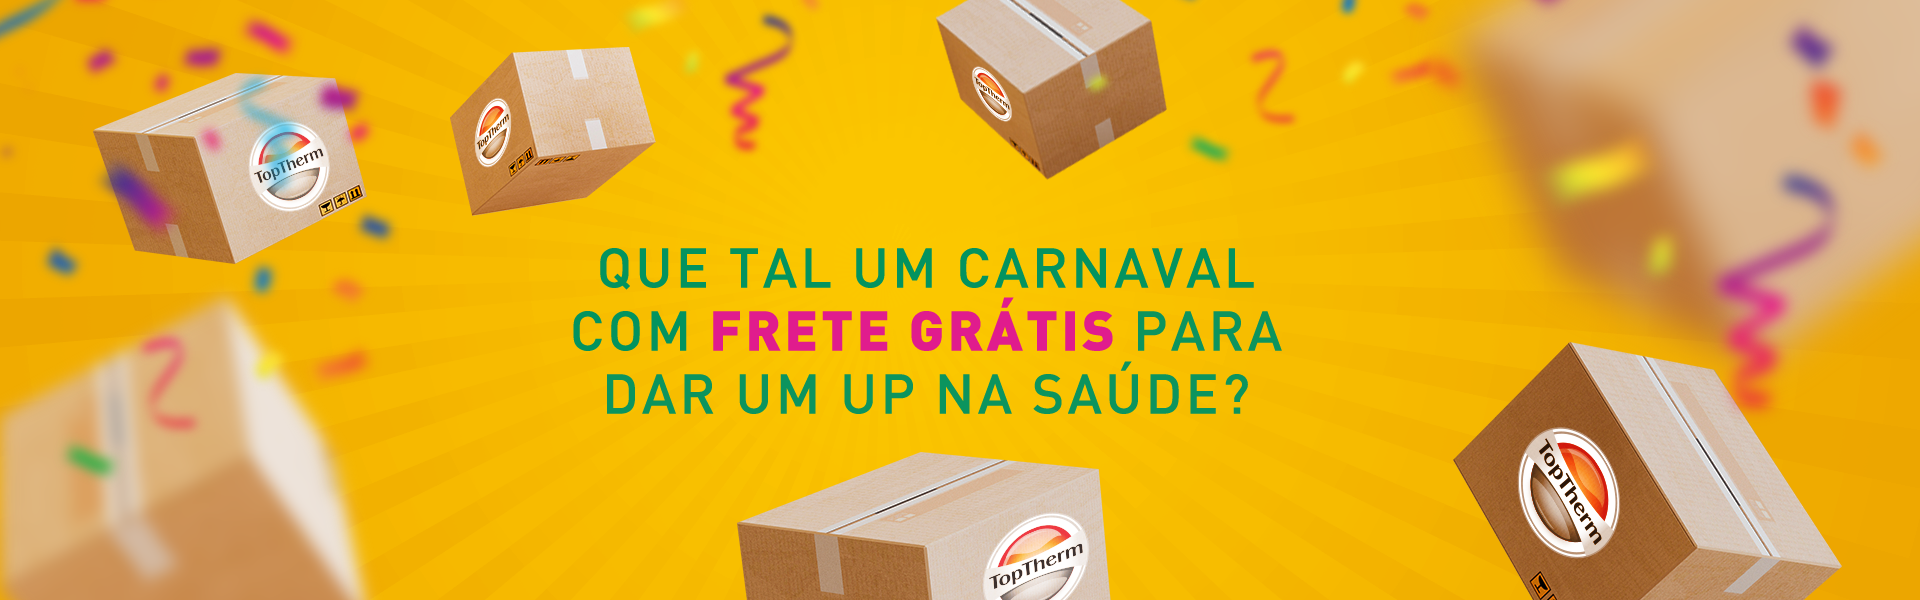 Carnaval Frete Gratis